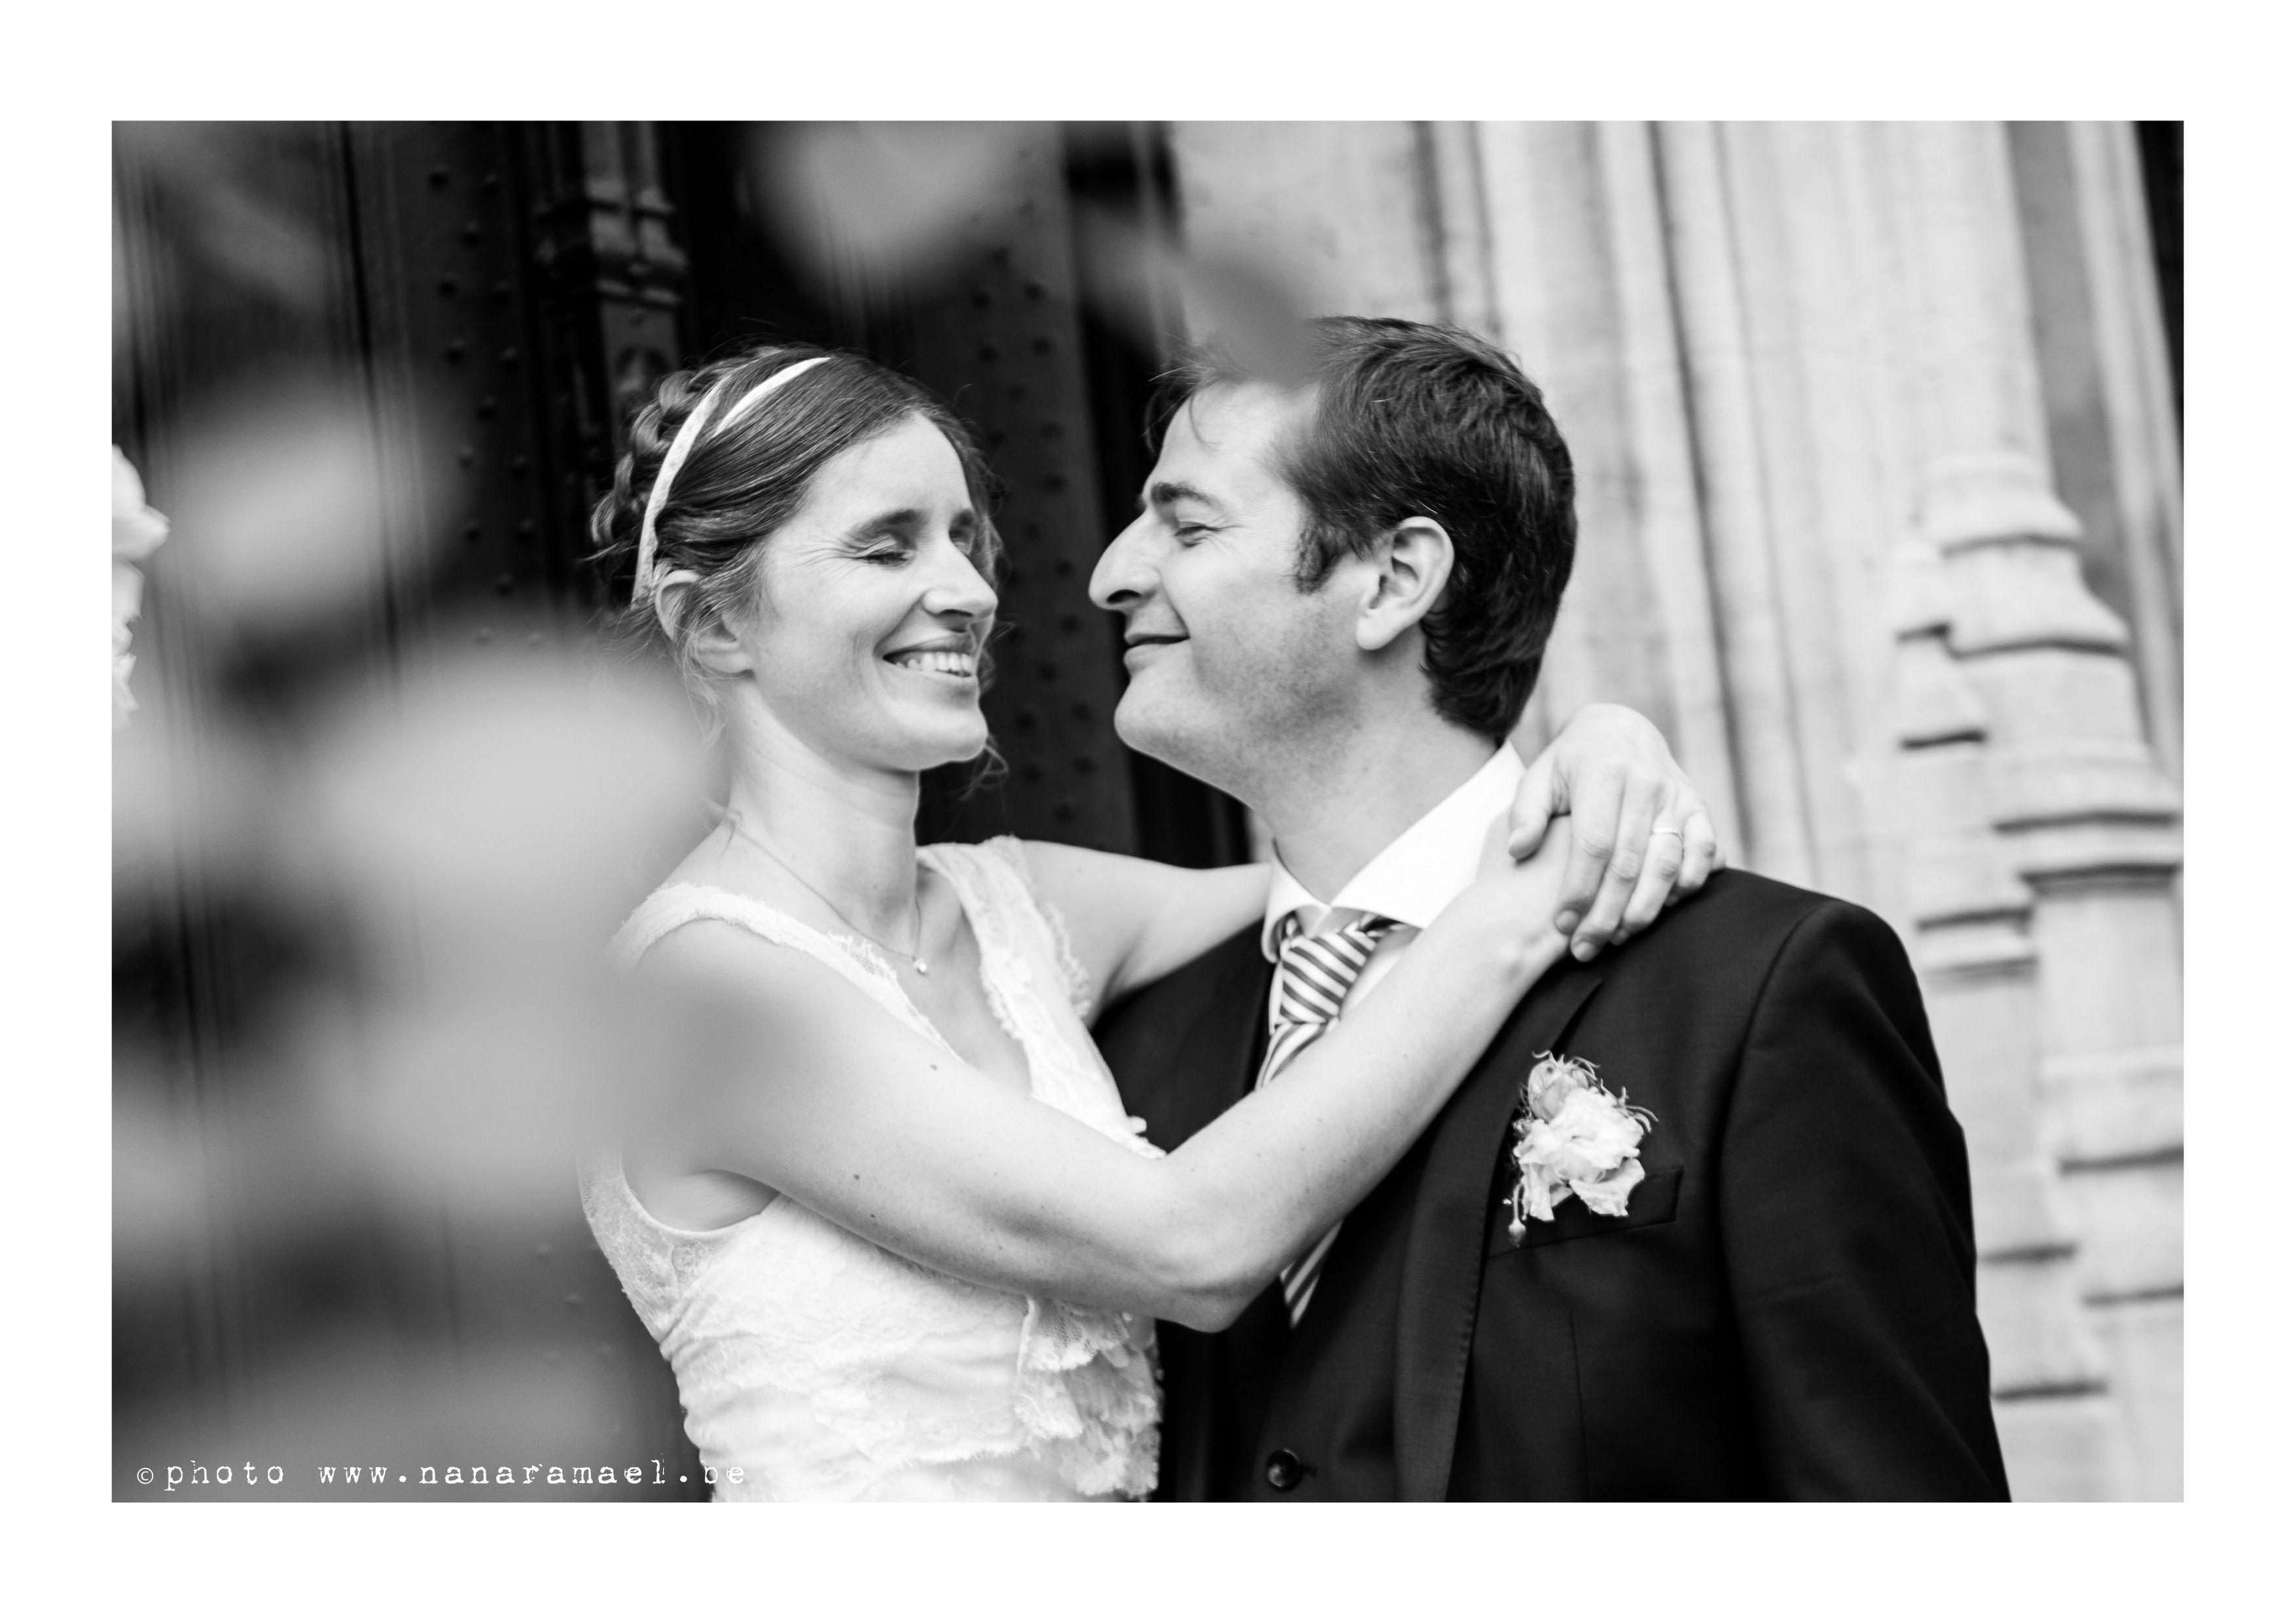 wedding & event photography www.nanaramael.be #wedding #marriage #bridal #weddingphotography #inspiration #photography #huwelijksfotografie #huwelijk #trouw #trouwreportage #bruid